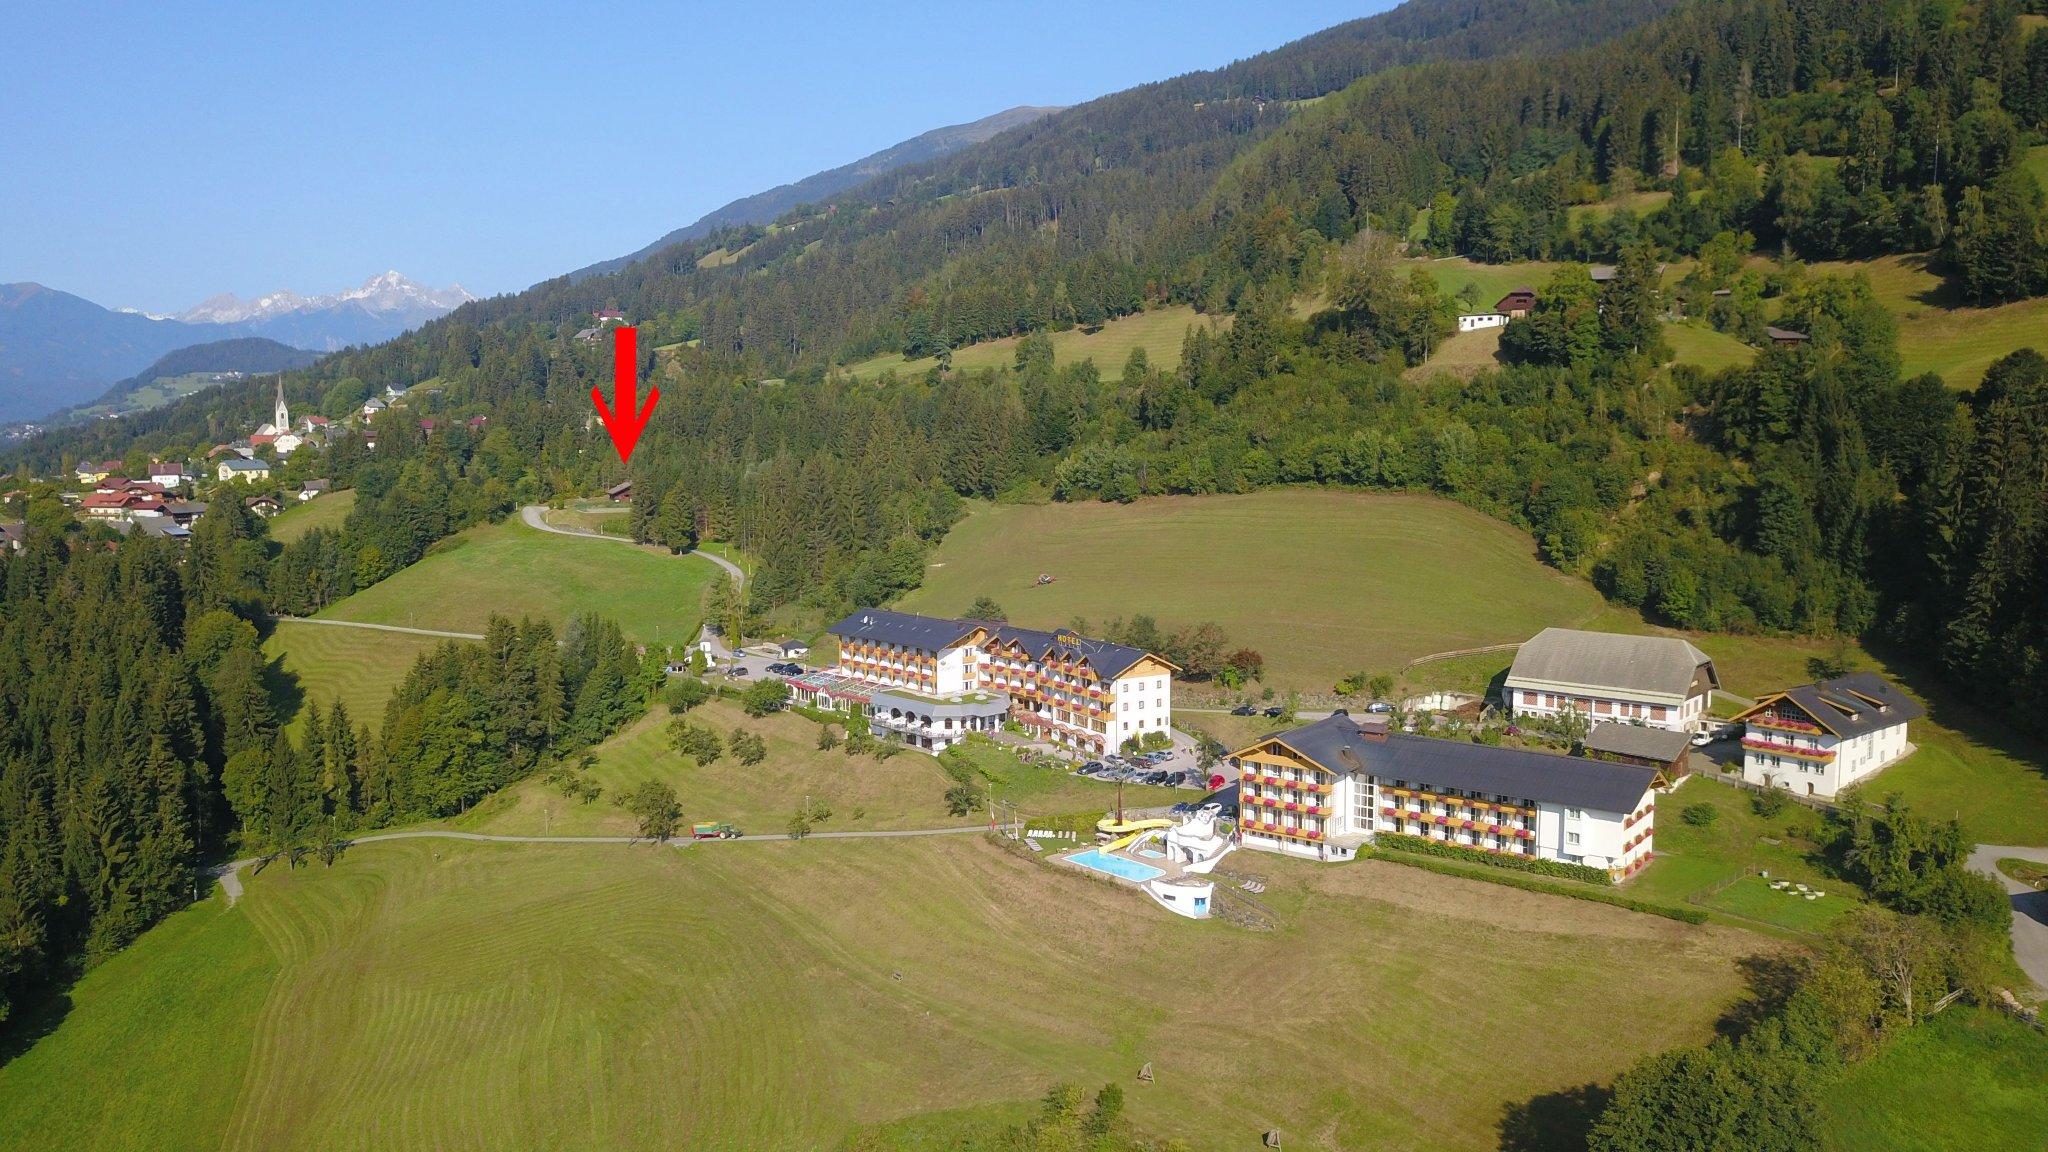 Glocknerhaus oberhalb des Glocknerhof